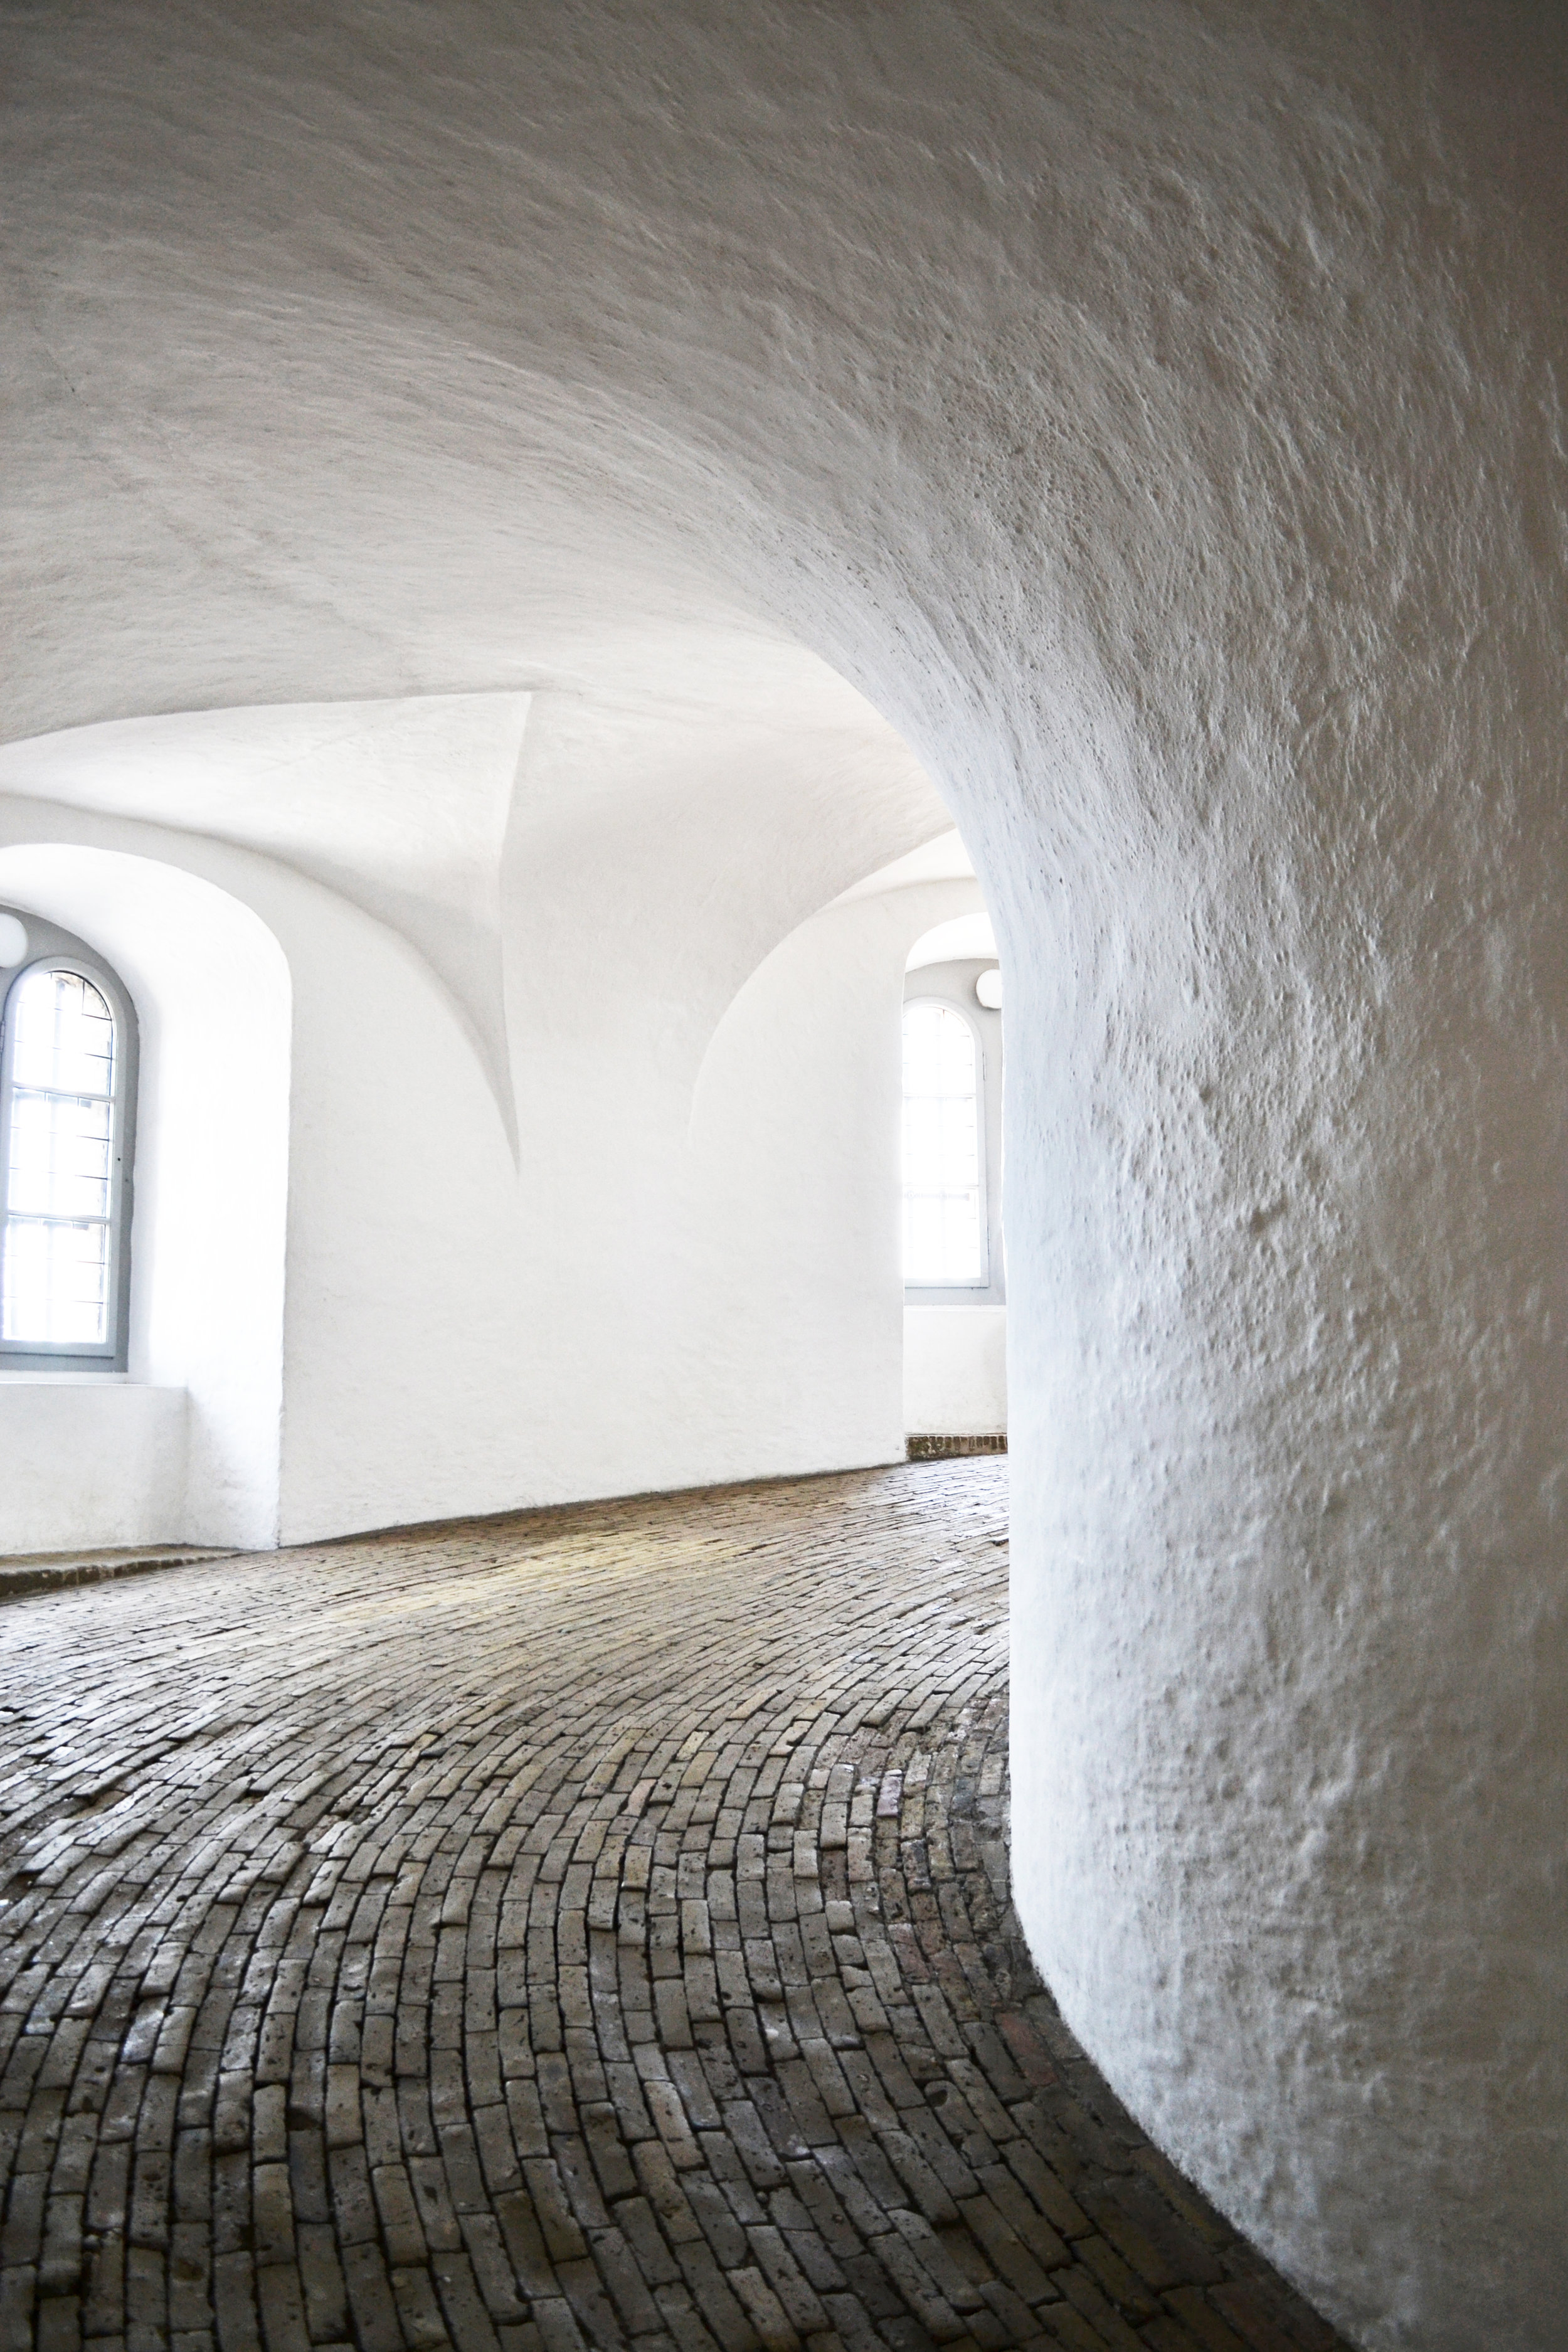 StudioGabrielle_Guide_Copenhagen_StylistEye_TheRoundTower